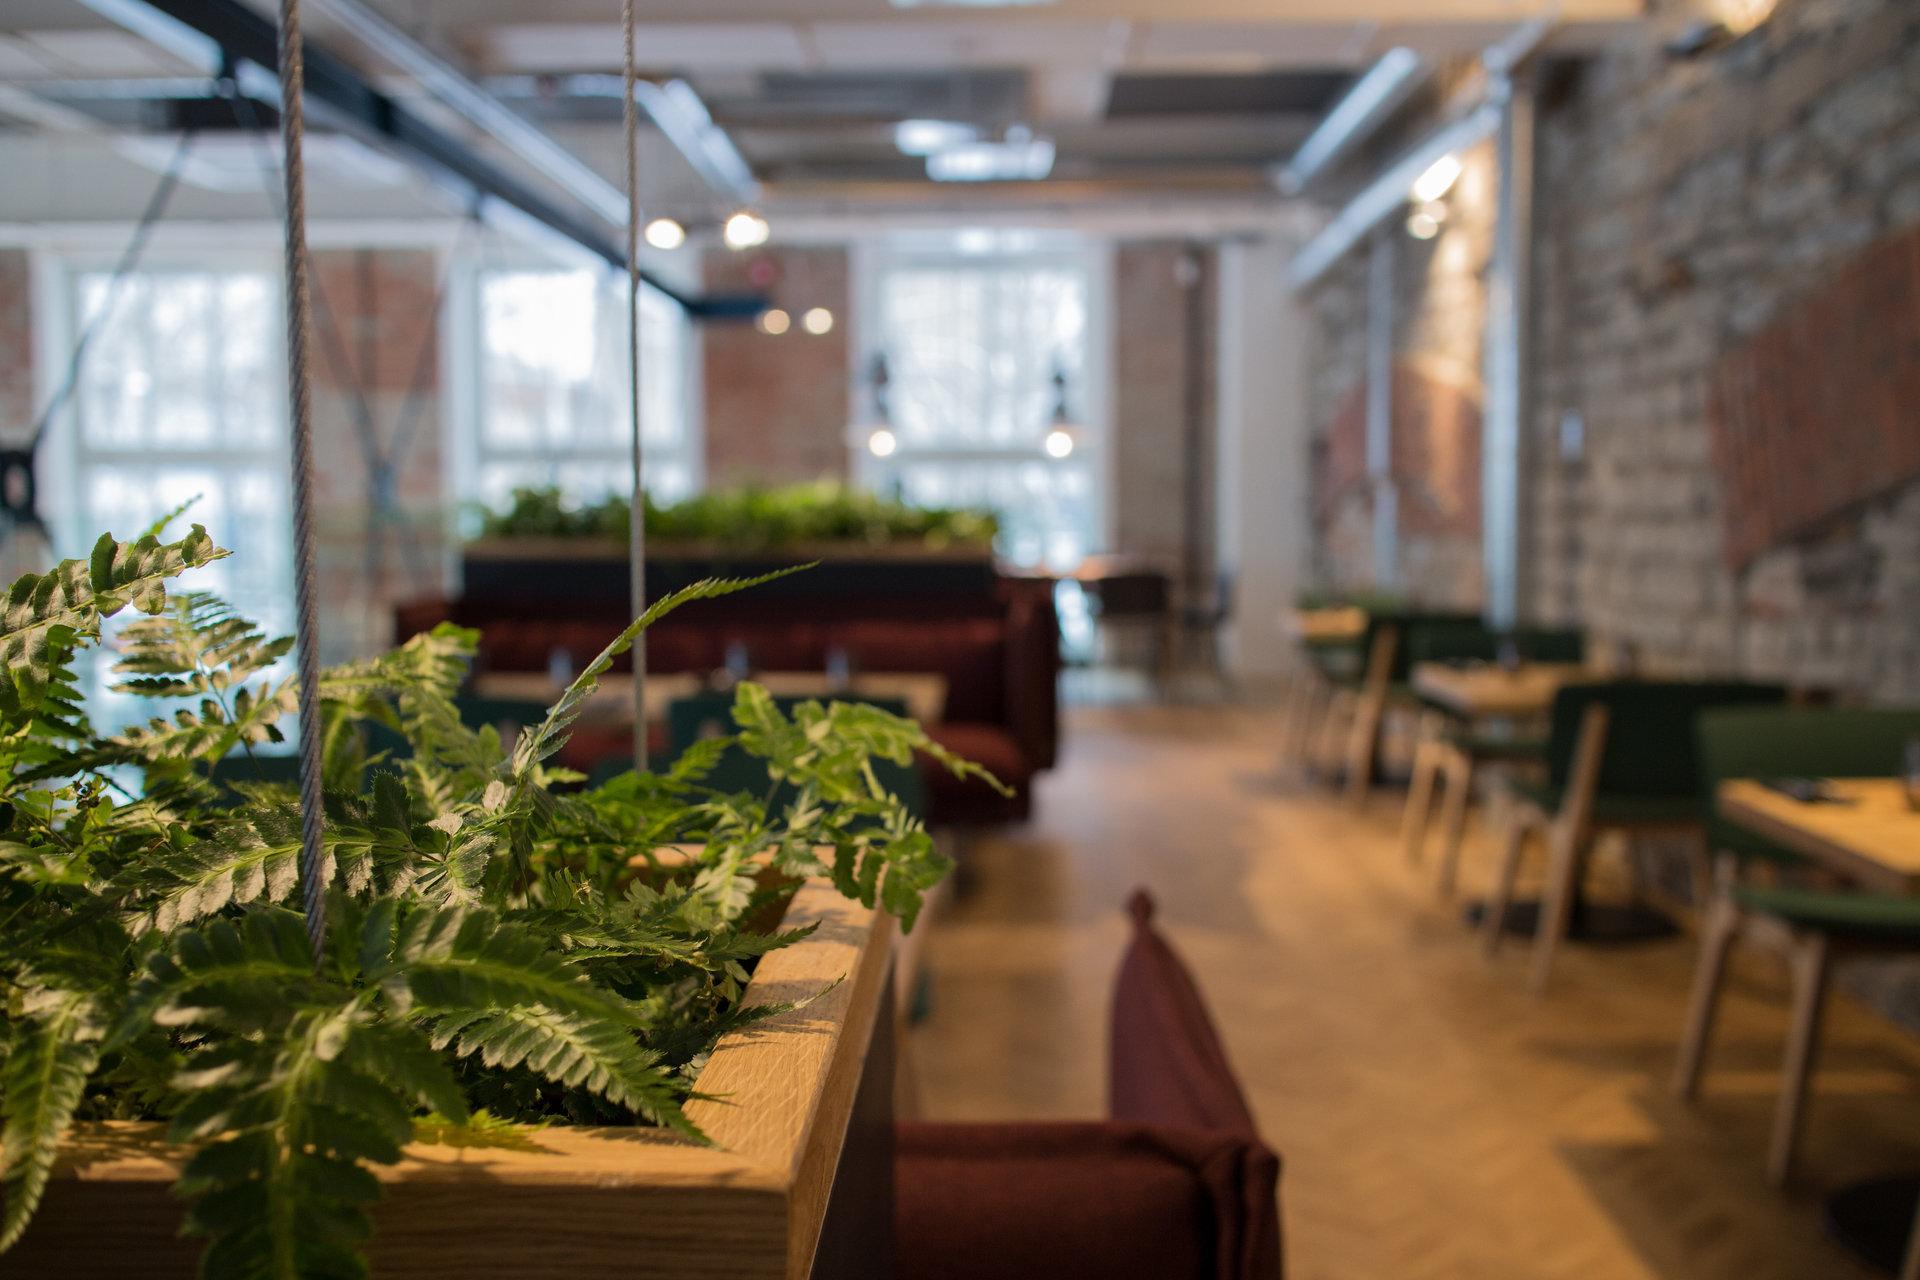 Gourmet Coffee restoran JUUR: A Work-Friendly Place in Tallinn